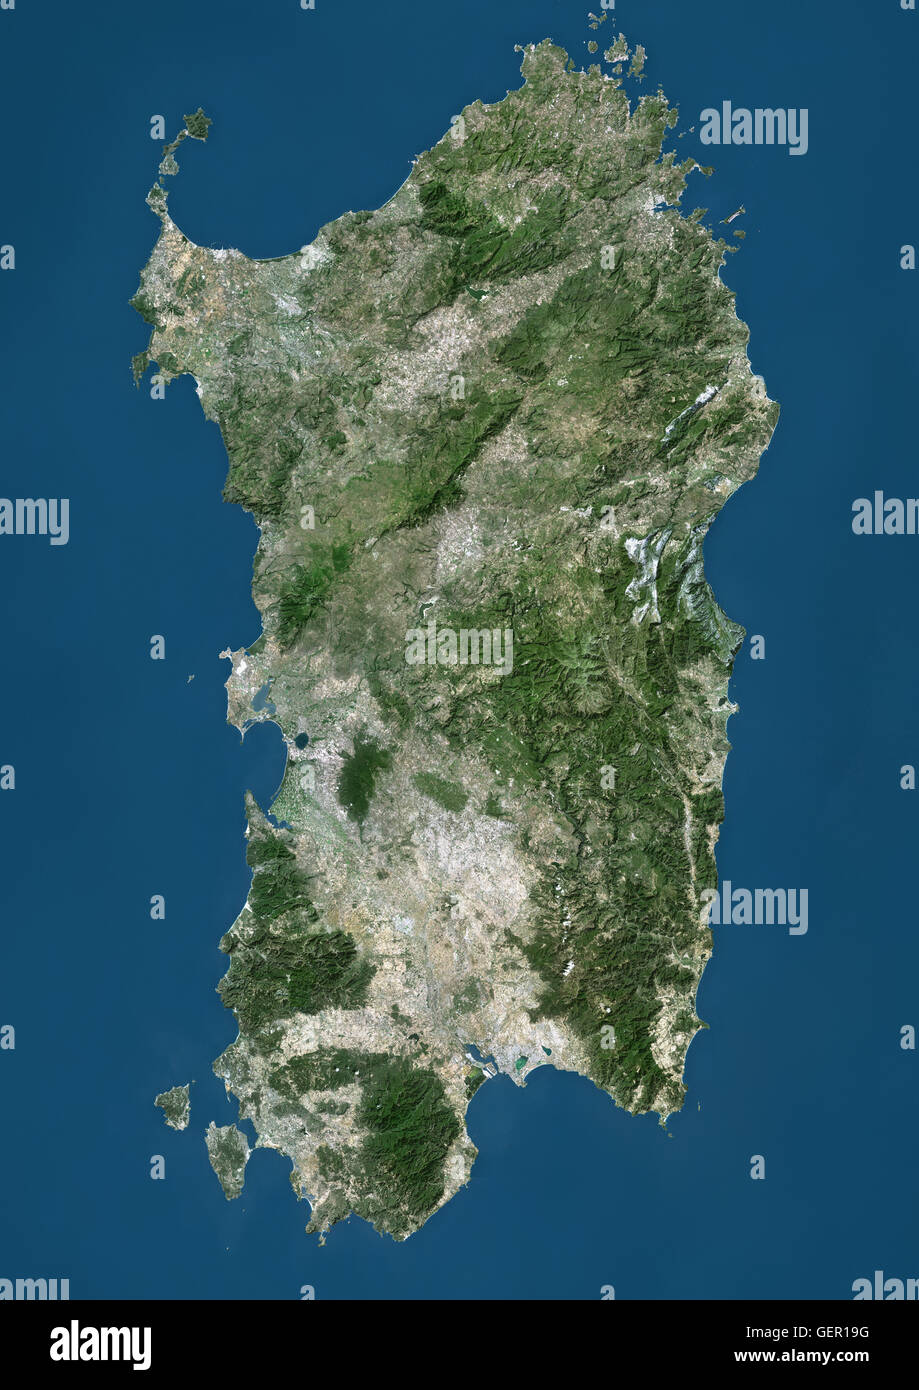 Cartina Sardegna Satellite.Satellite View Sardinia High Resolution Stock Photography And Images Alamy